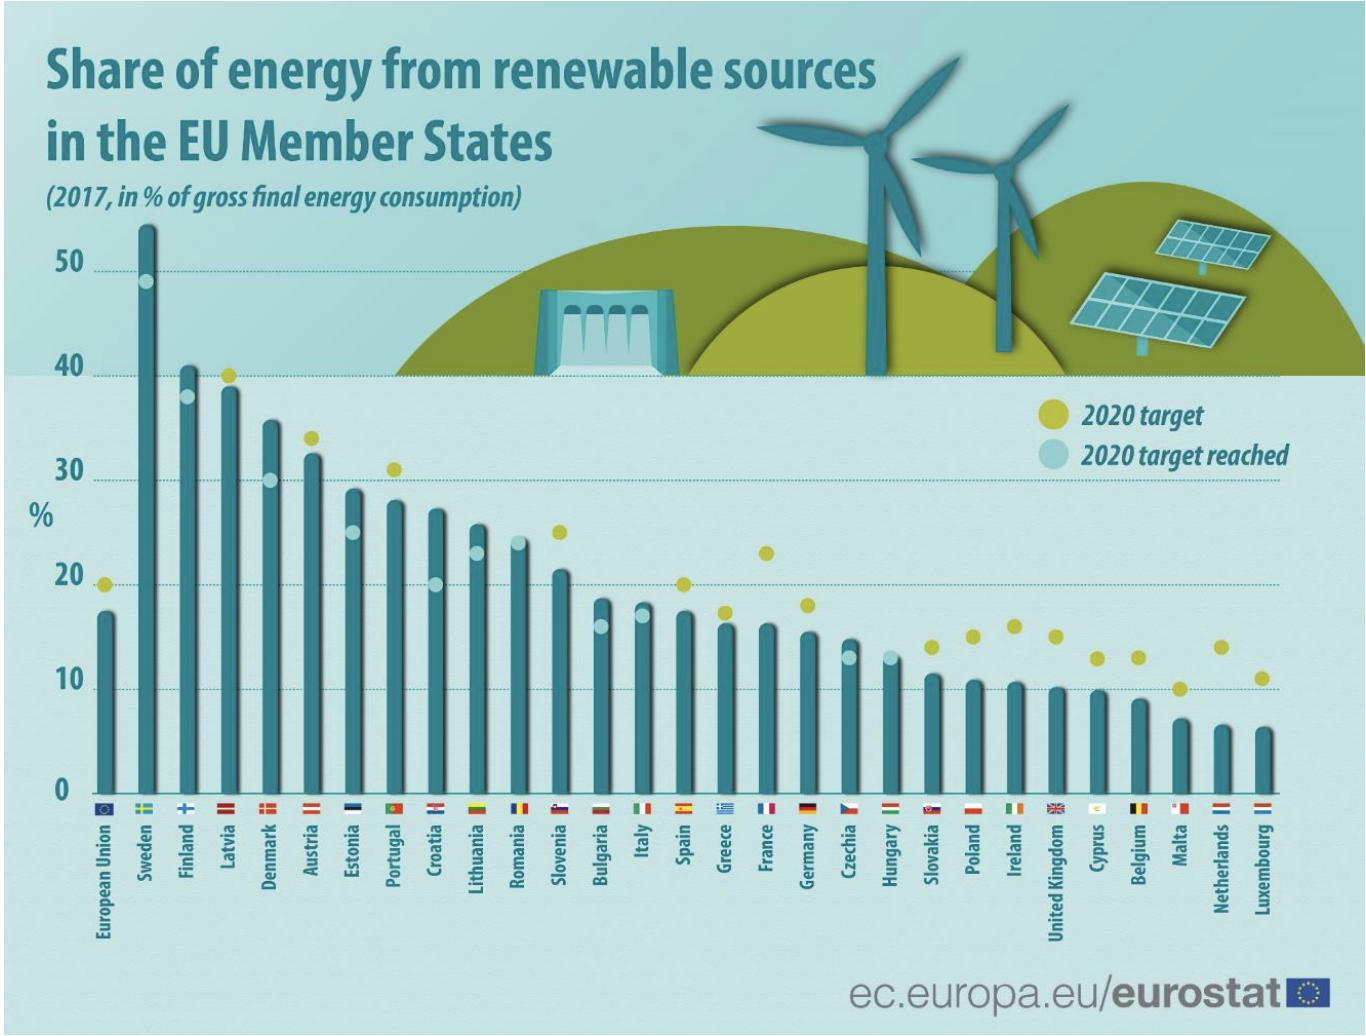 【EU】2017年の最終エネルギー消費に占める再エネ・風力割合が17.5%に上昇。2020年目標は20% 2